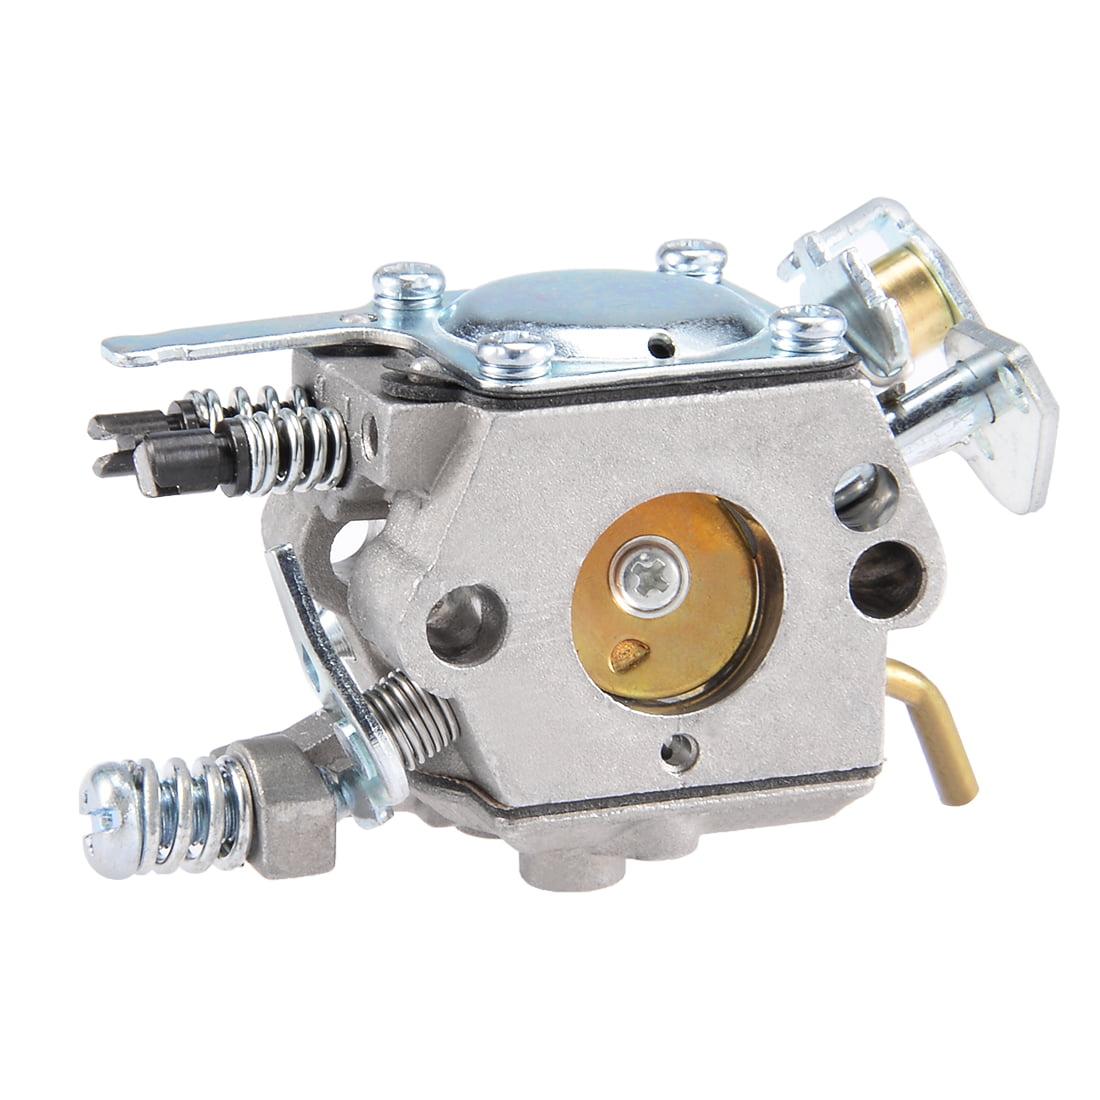 Carburetor For Husqvarna 36 41 136 137 141 142 Chainsaw Rep Walbro WT-657 WT-834